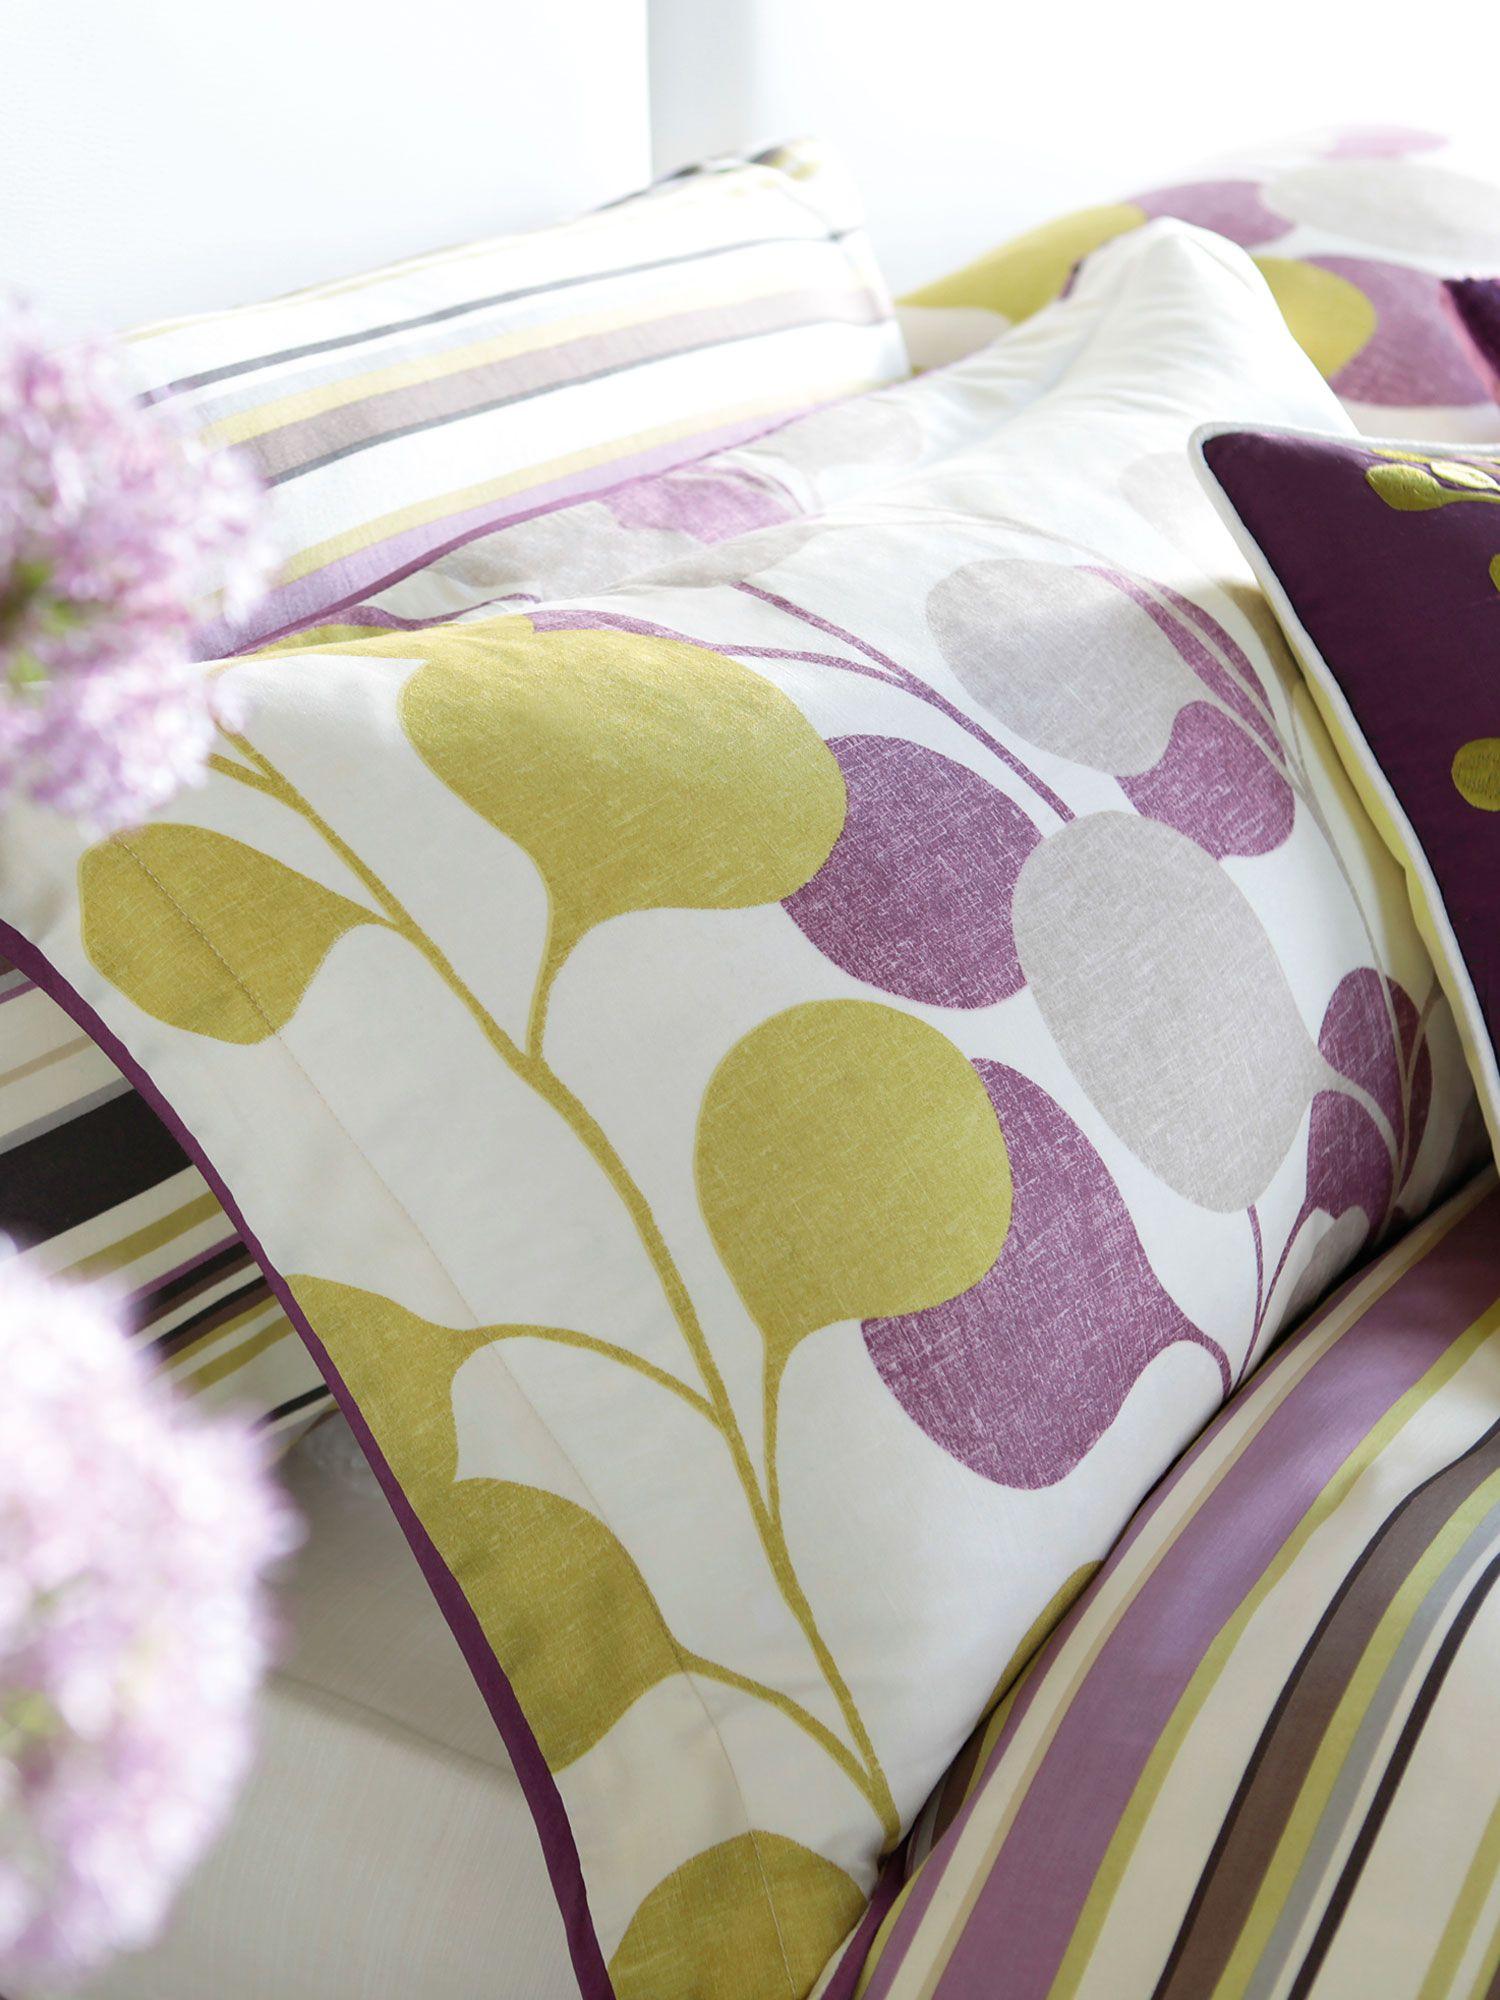 Harlequin Pod mulberry oxford pillowcase : 1741101319641613 from www.rosebys.co.uk size 1500 x 2000 jpeg 282kB